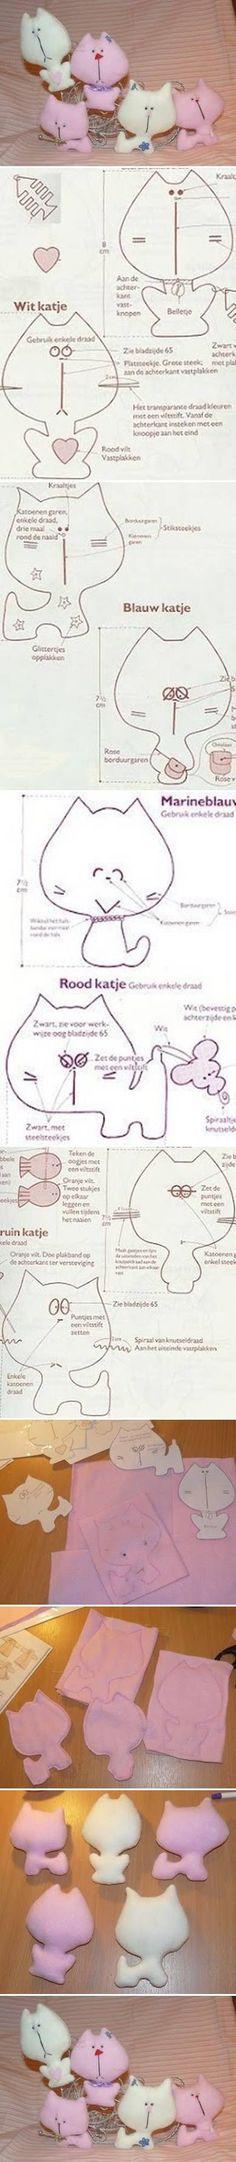 DIY Cute Little Fabric Cats DIY Cute Little Fabric Cats